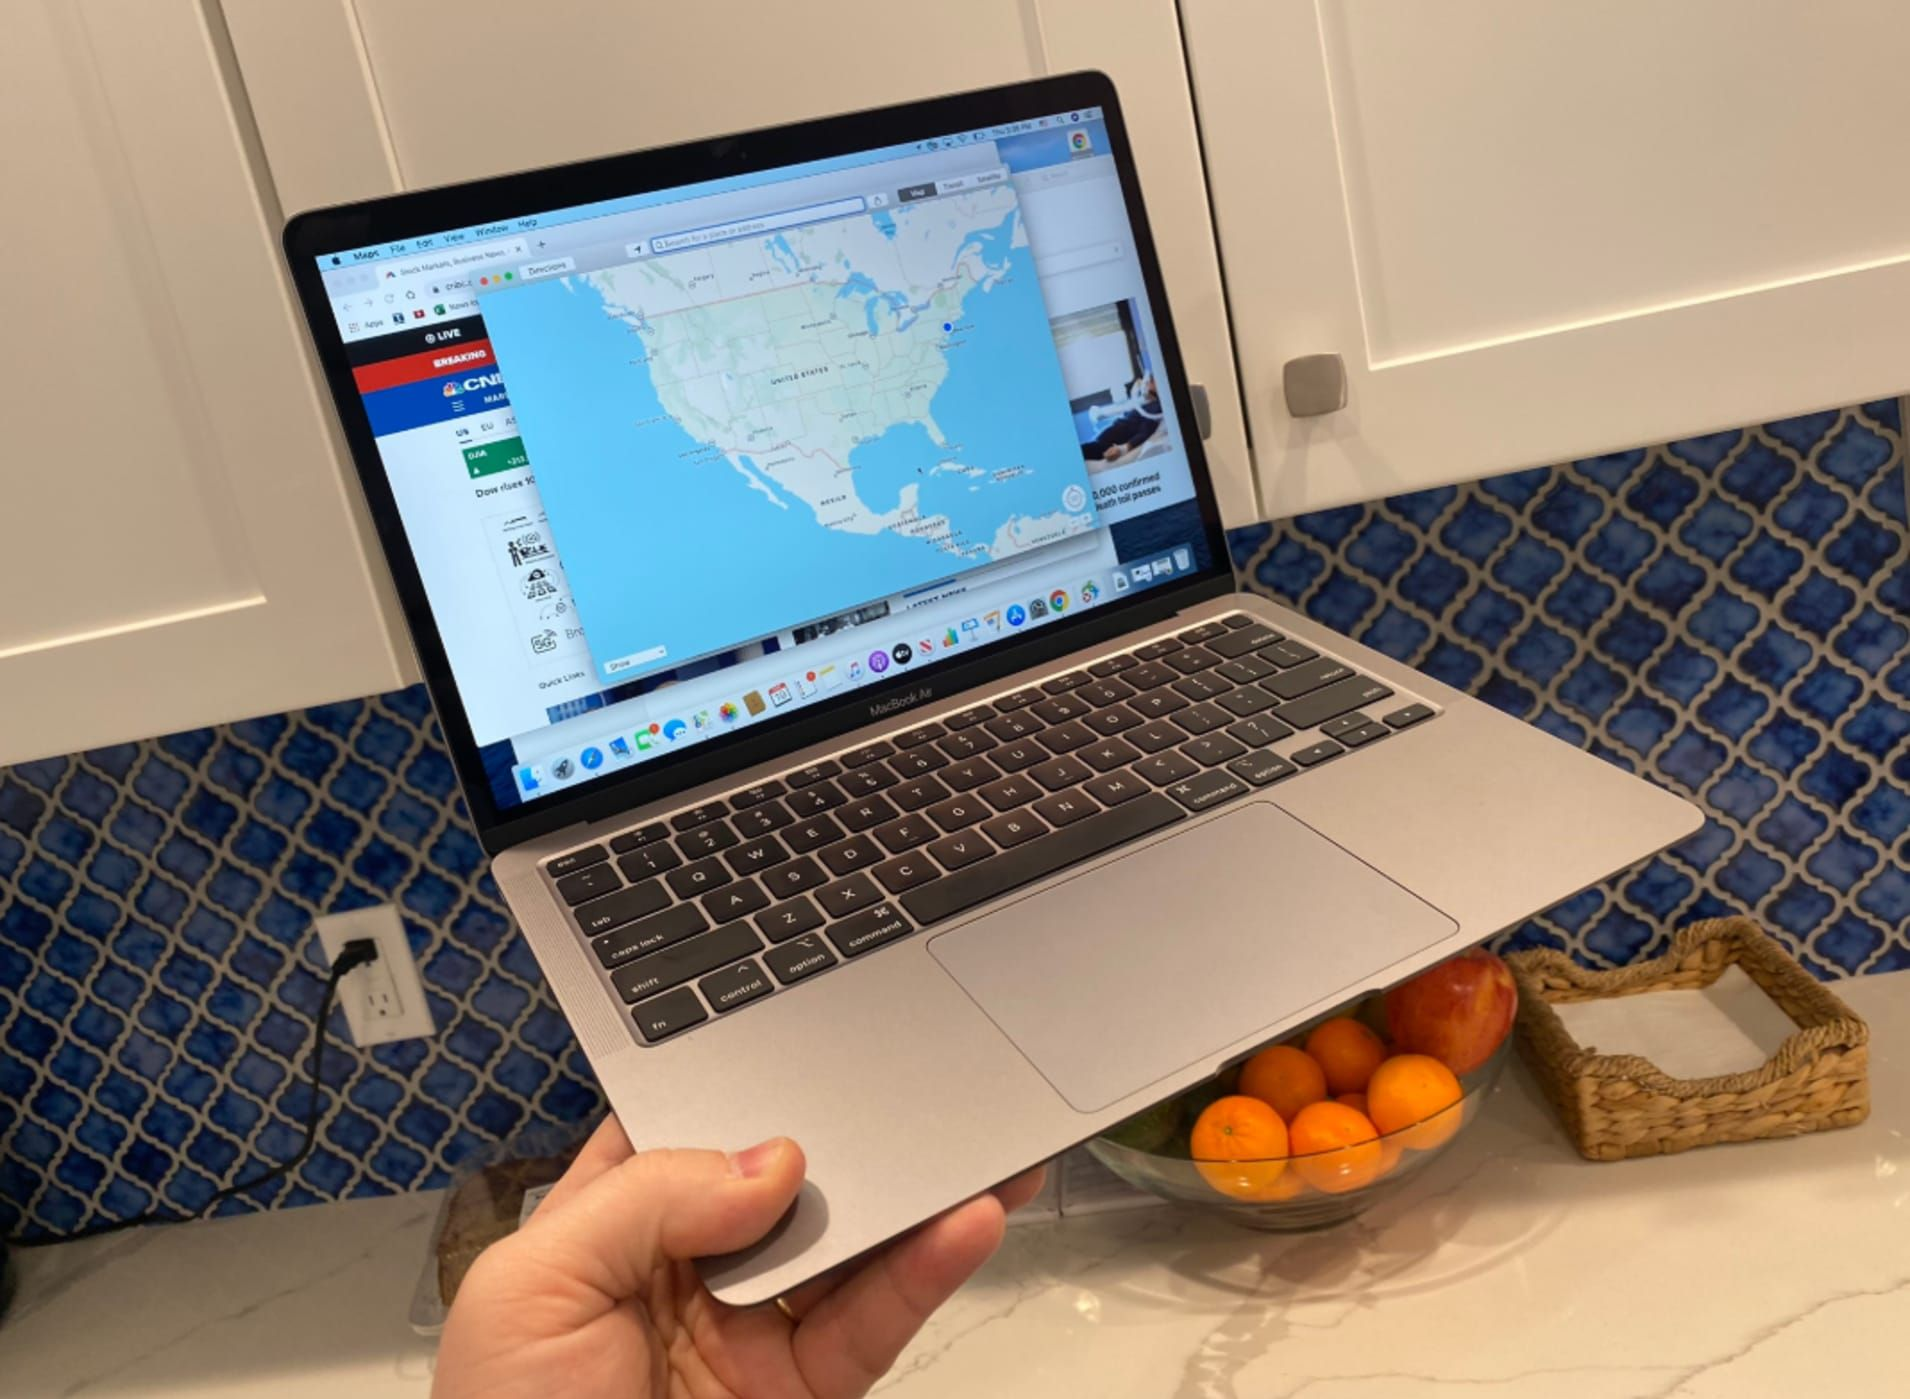 Macbook Air 2020, Should You Buy it